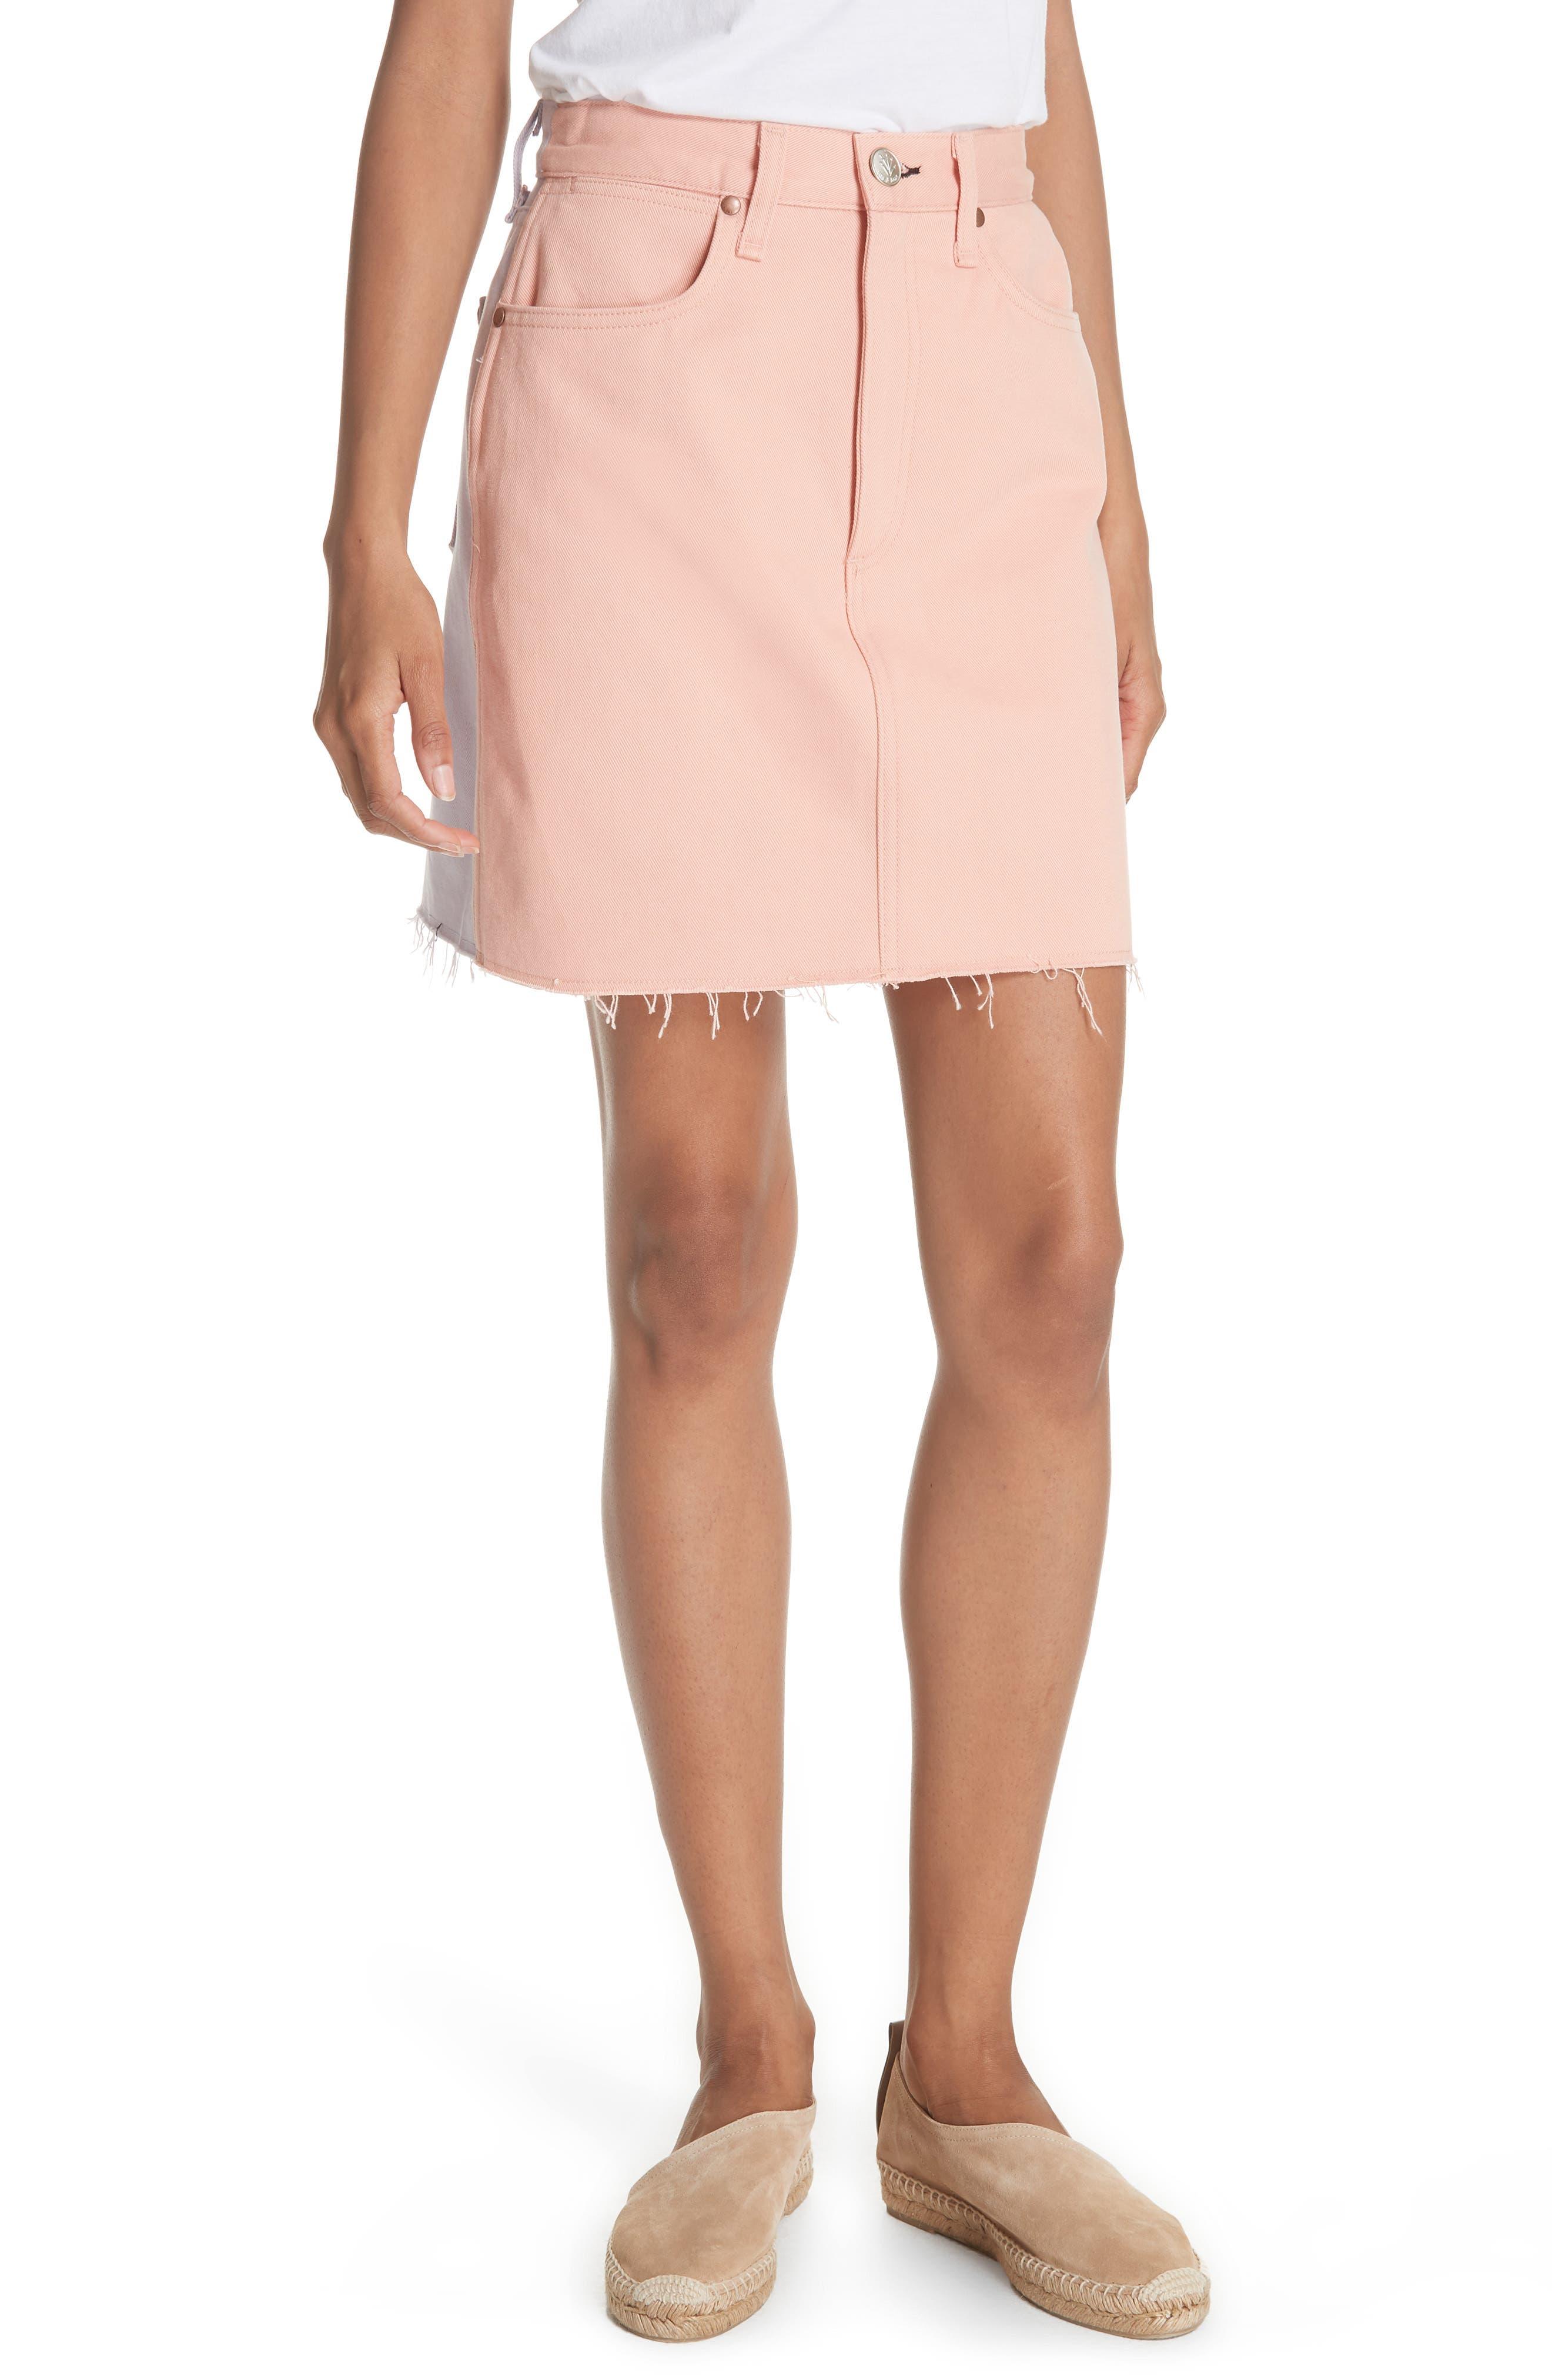 Moss Skirt,                             Main thumbnail 1, color,                             950